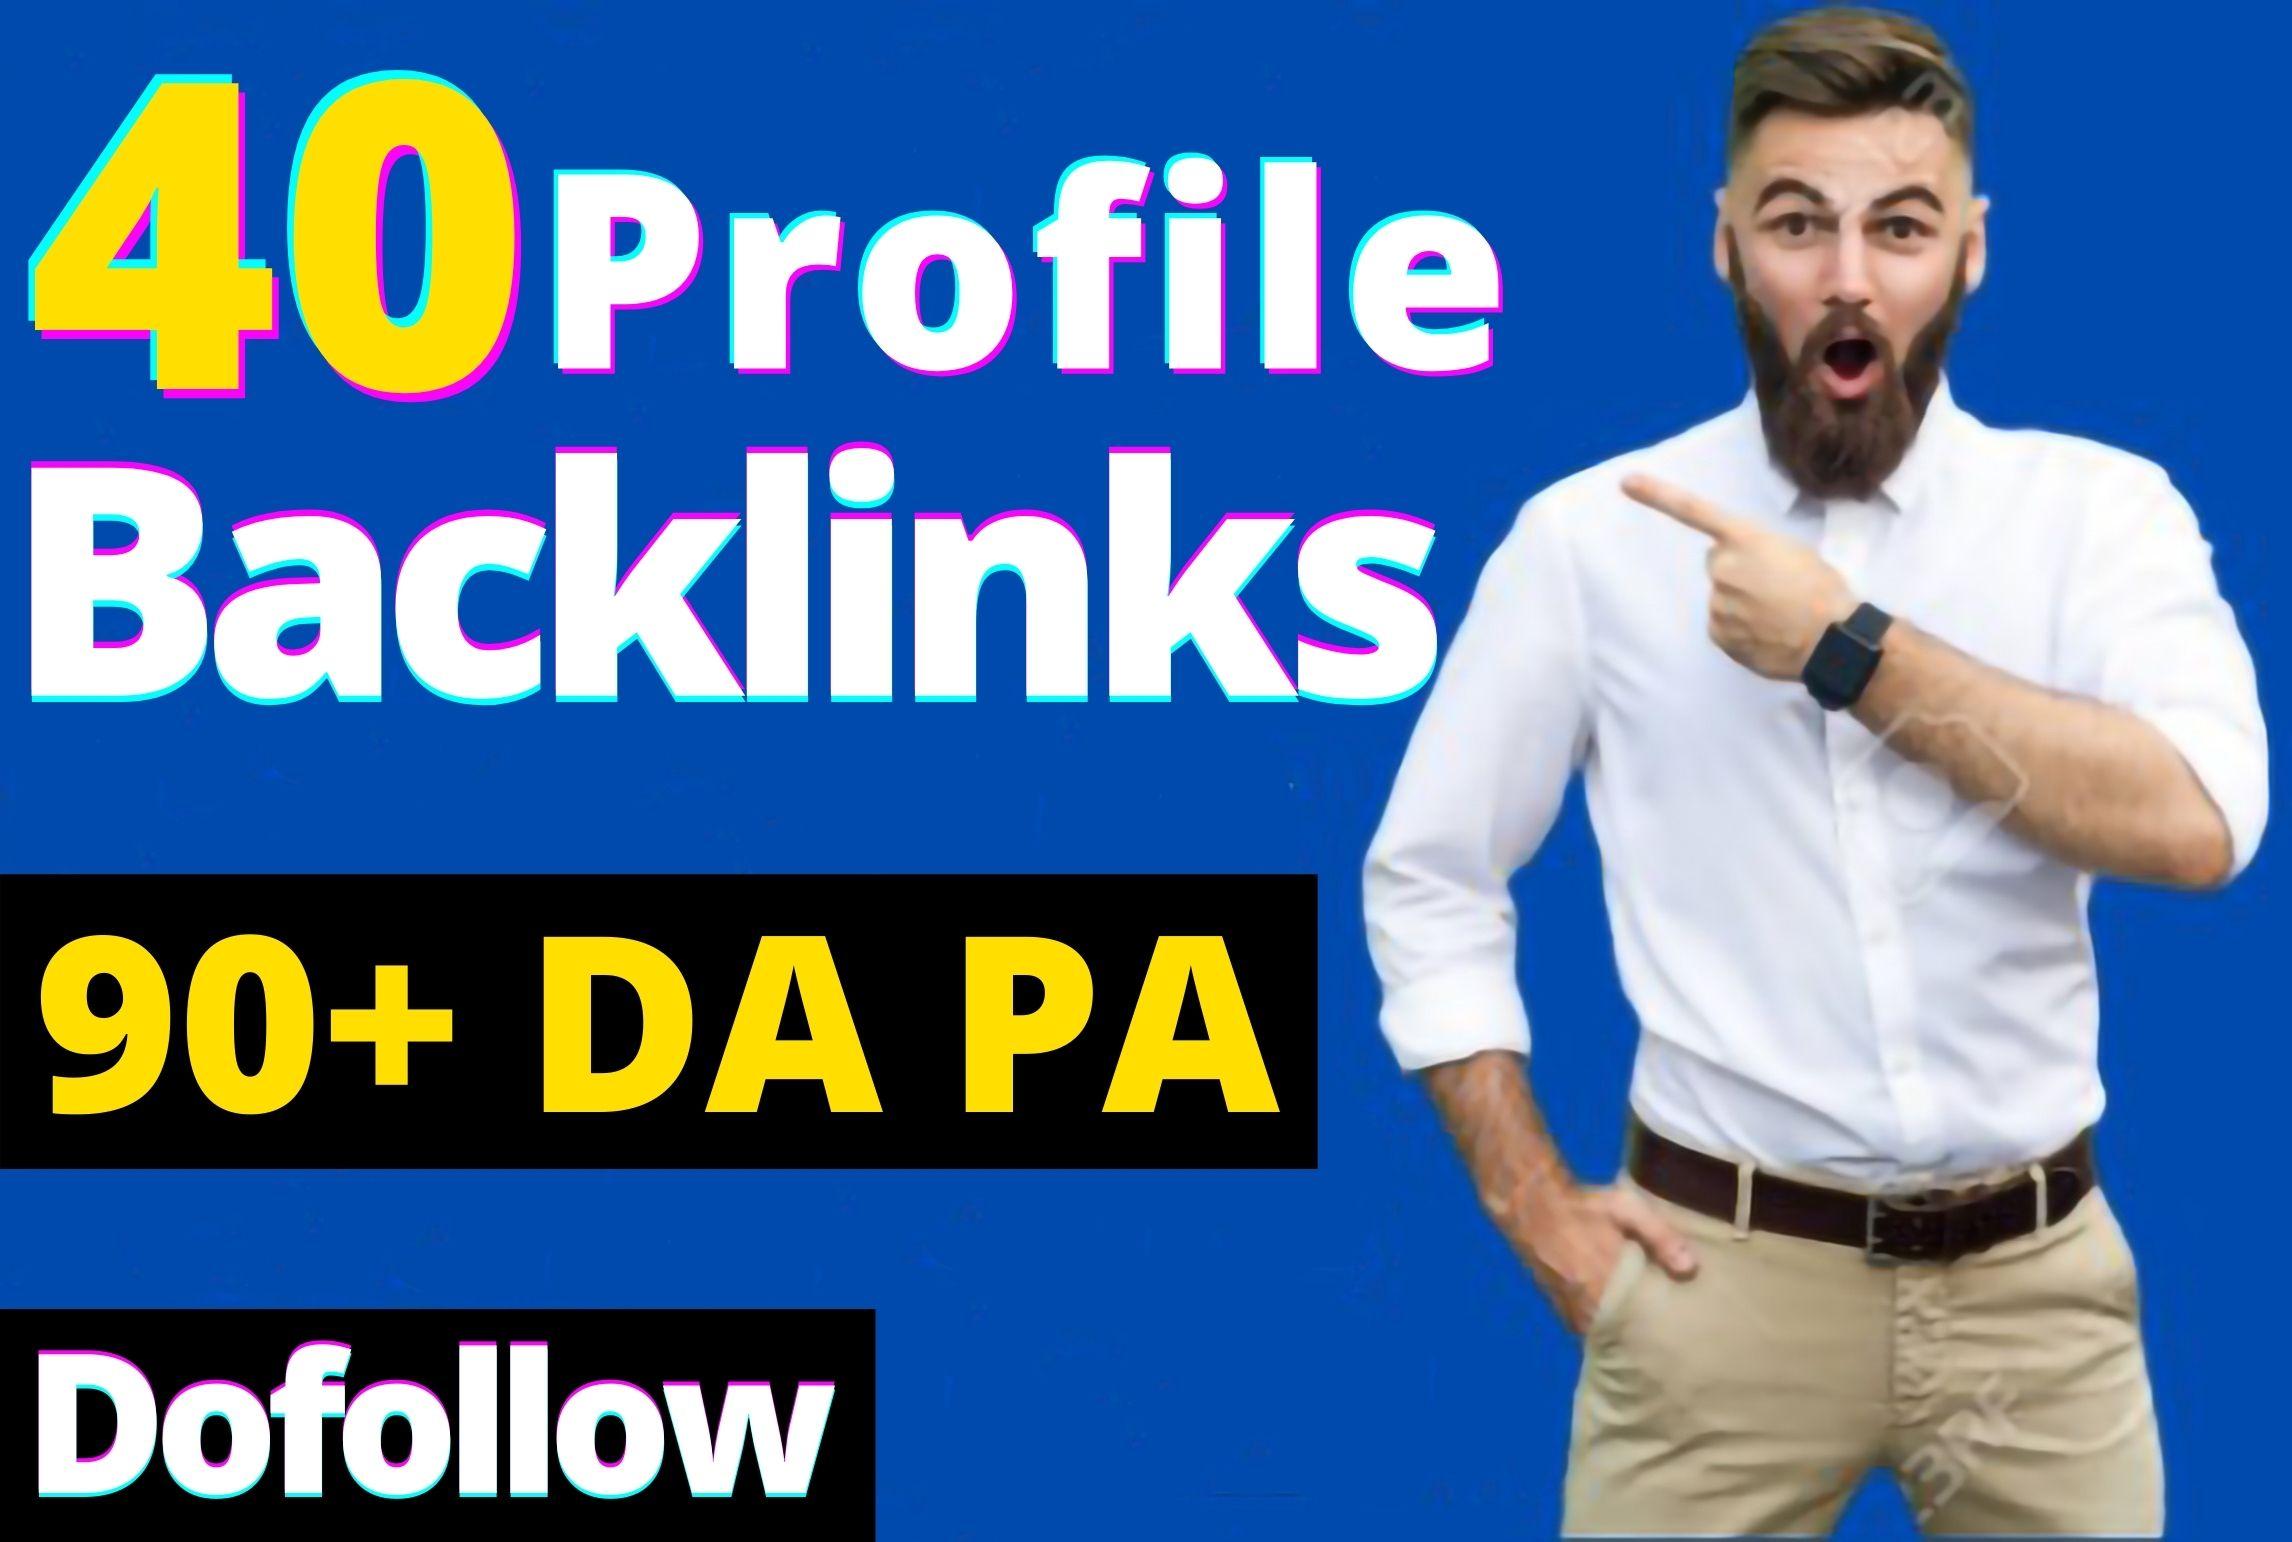 Dofollow 90+DA PA & PR9 40 Profile Backlinks